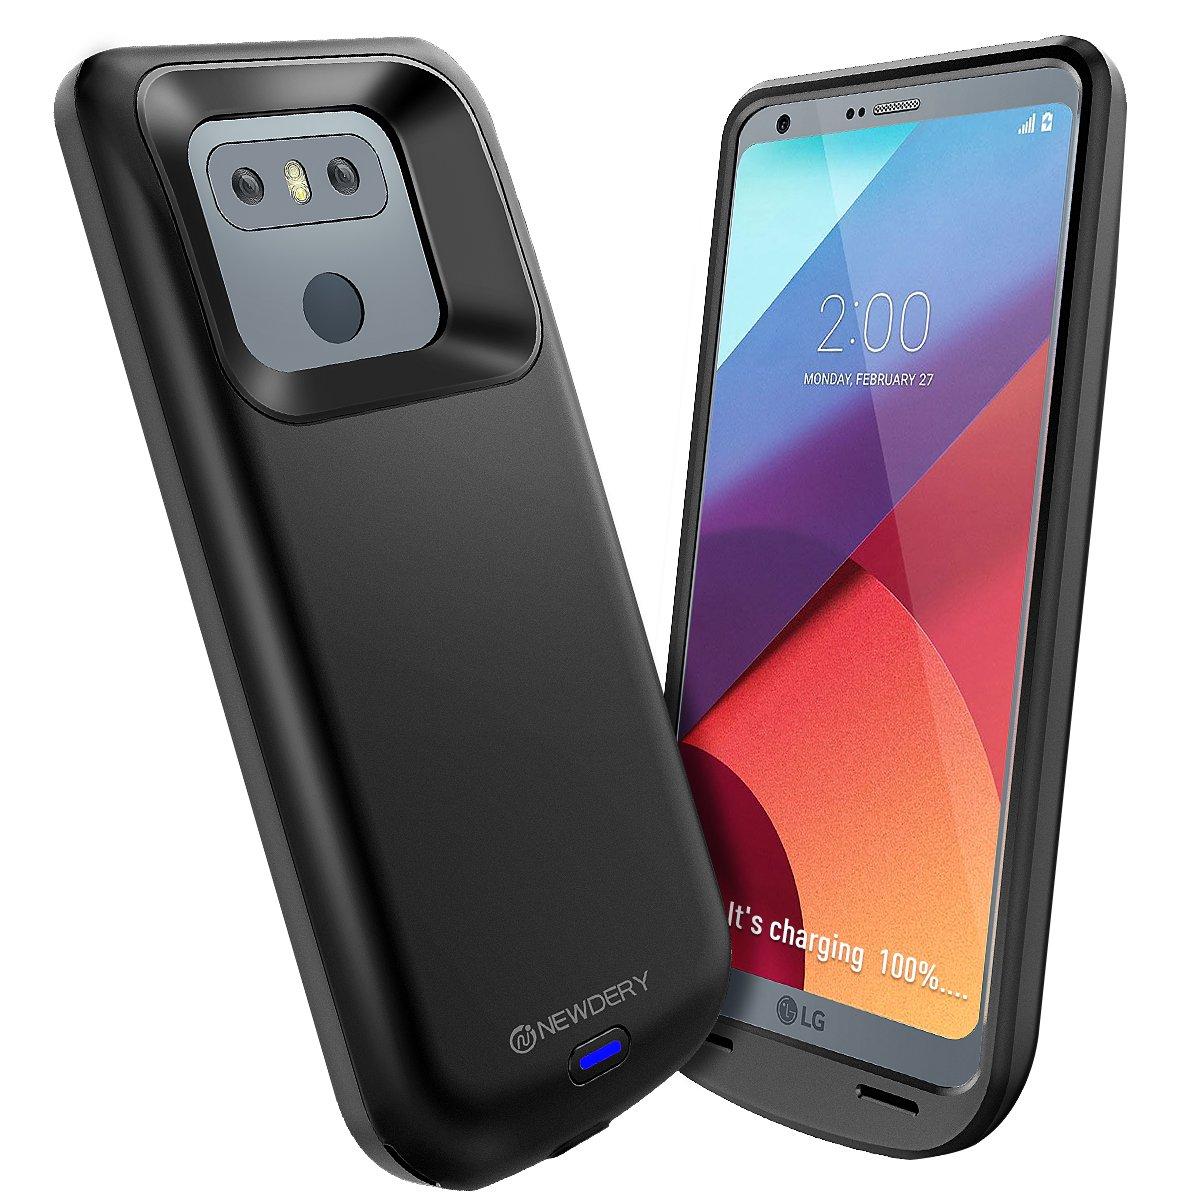 Funda para LG G6 Astro, Cargador portátil para LG G6 Astro[Negro] – 5000 mAh batería Pack Juice Power Bank Cover con Puerto de Entrada/Salida Type-C